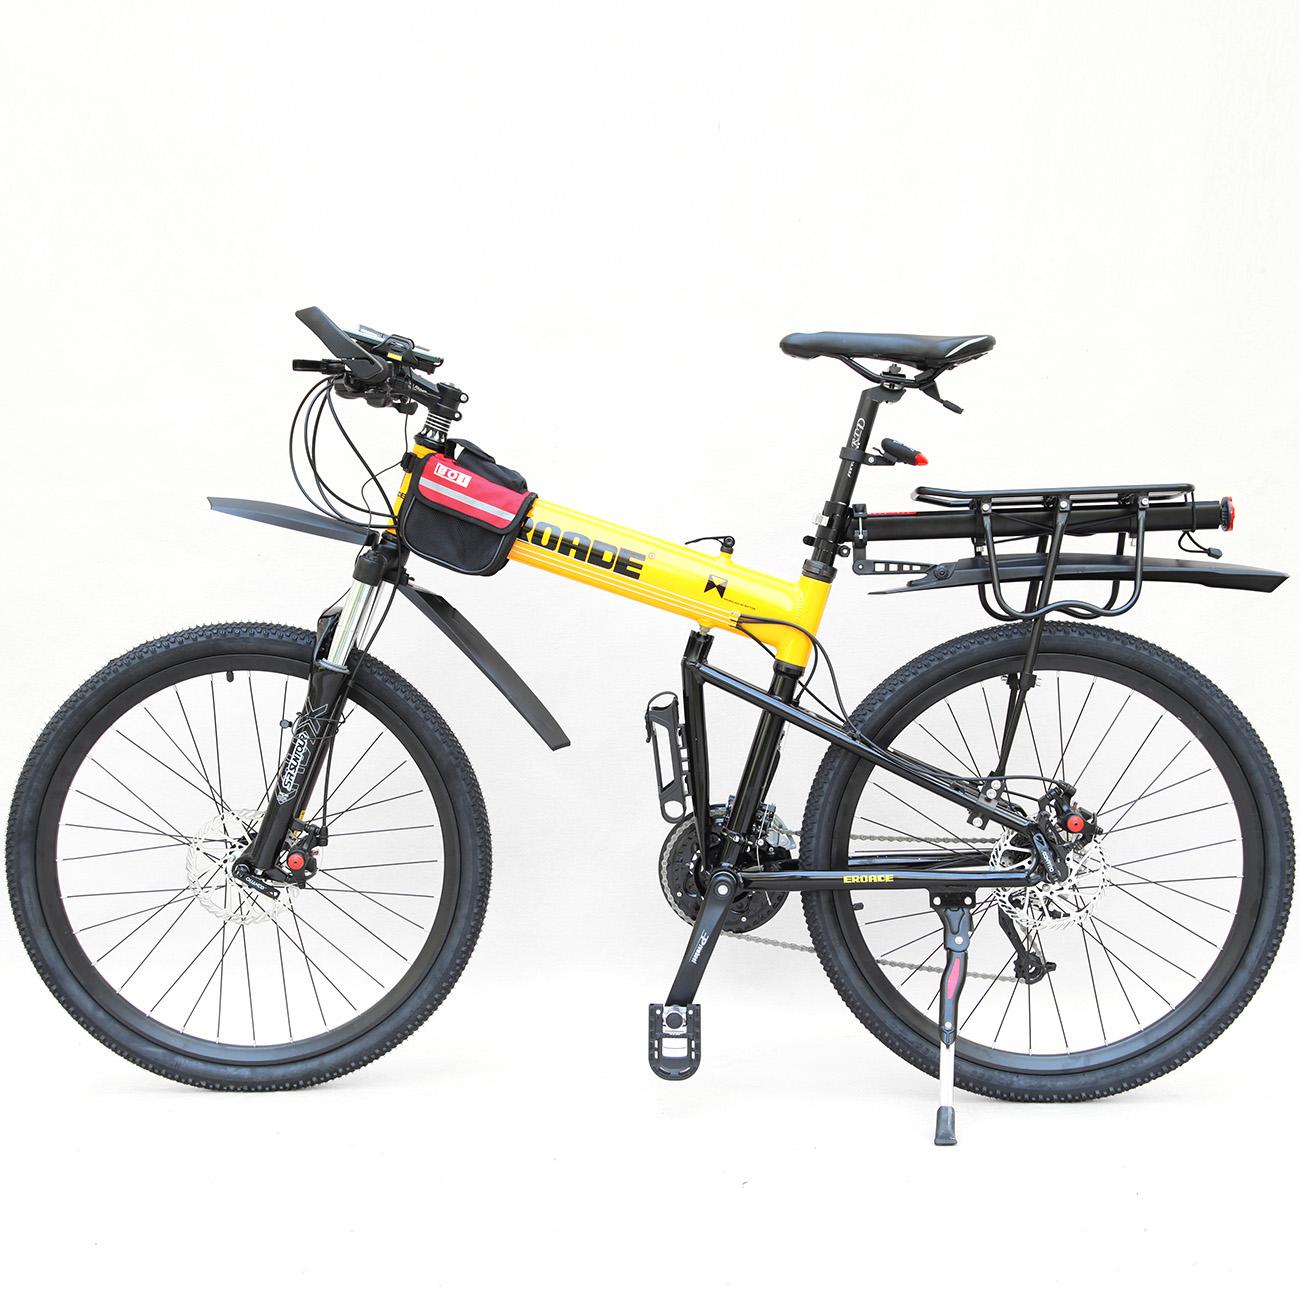 EROADE伊诺德20寸山地车变速自行车怎么样